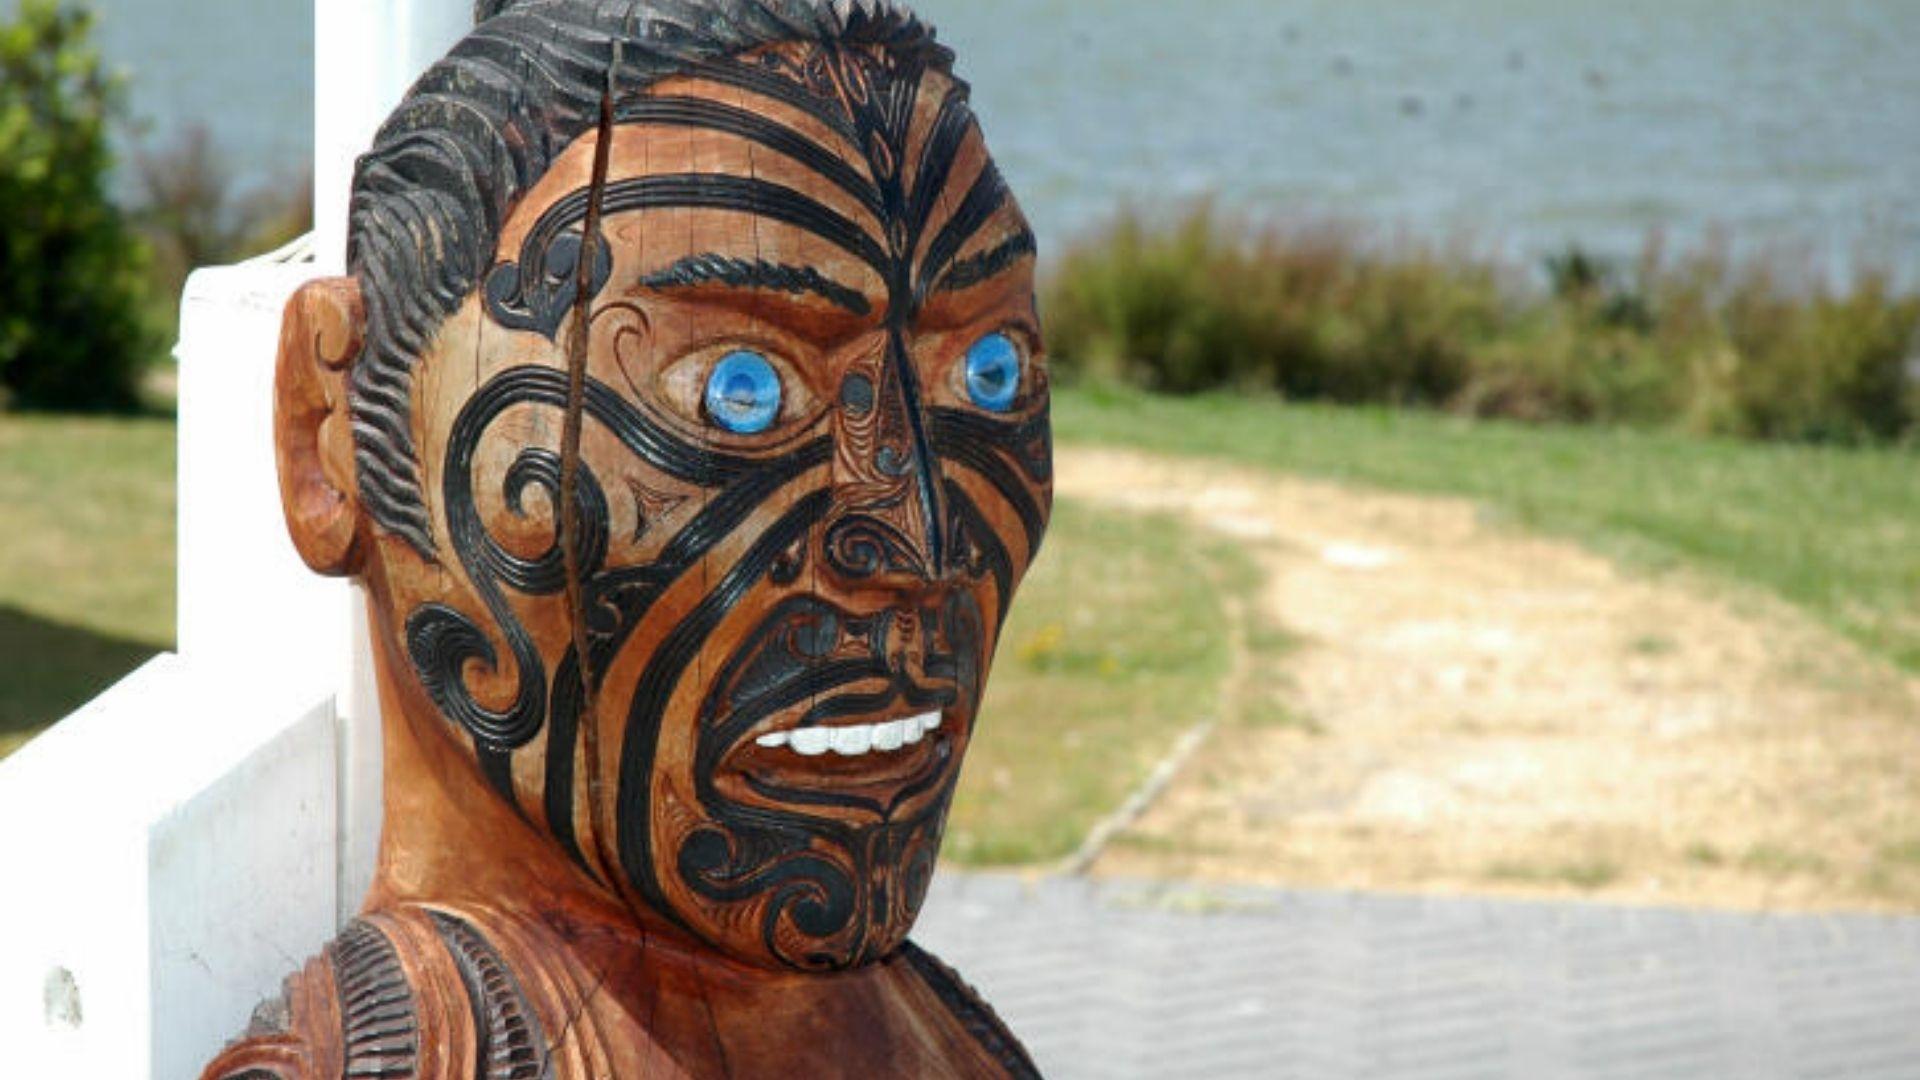 Tatuajes maouries significan belleza